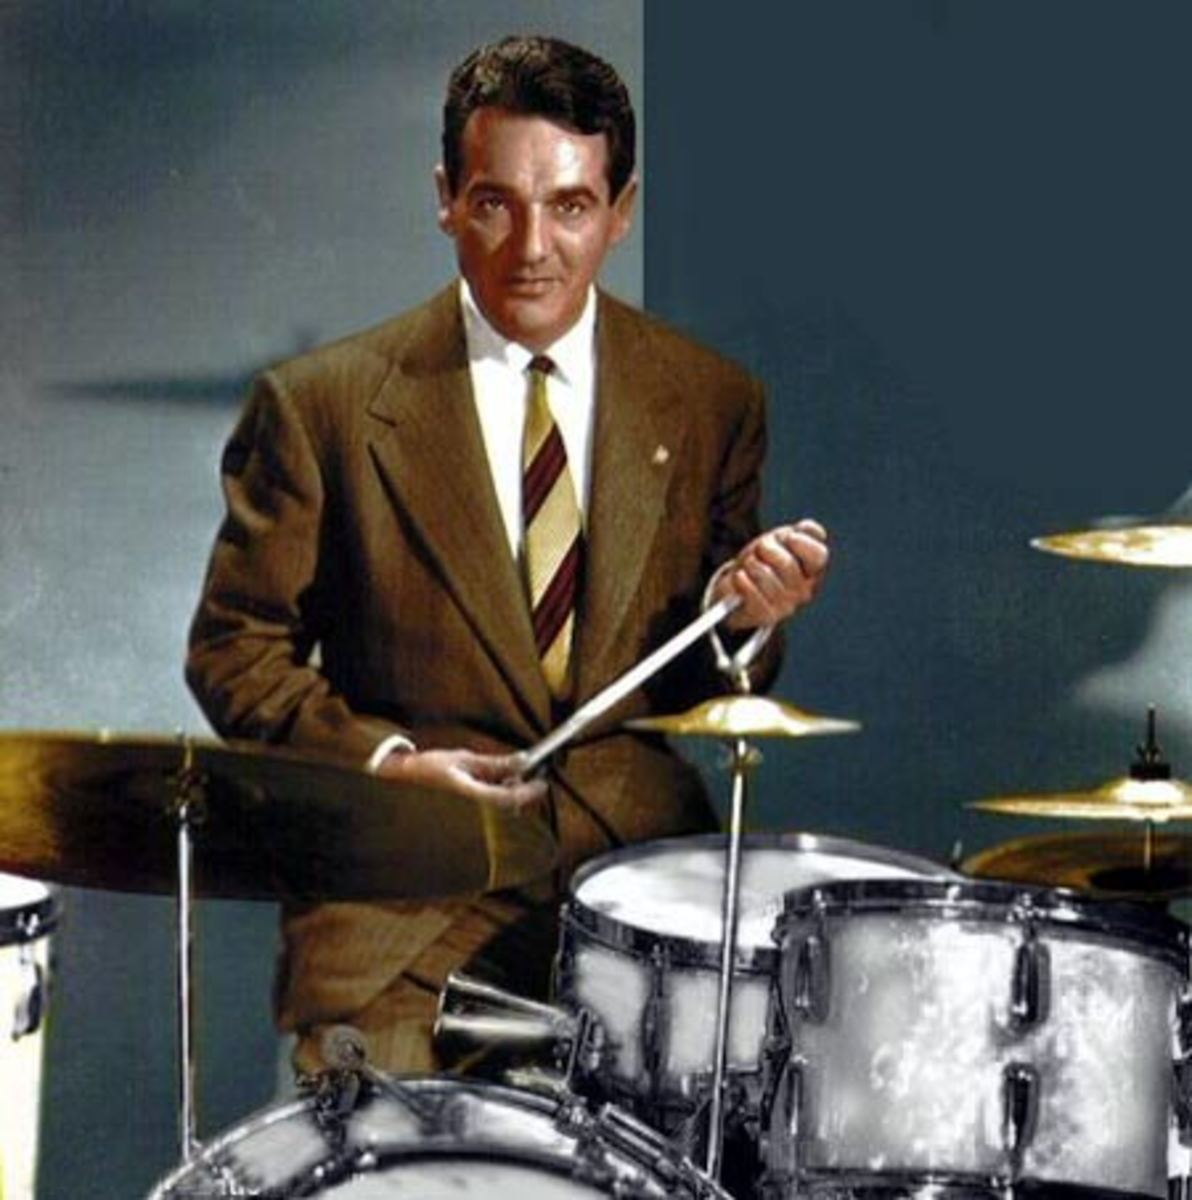 Gene Krupa, the first super star drummer